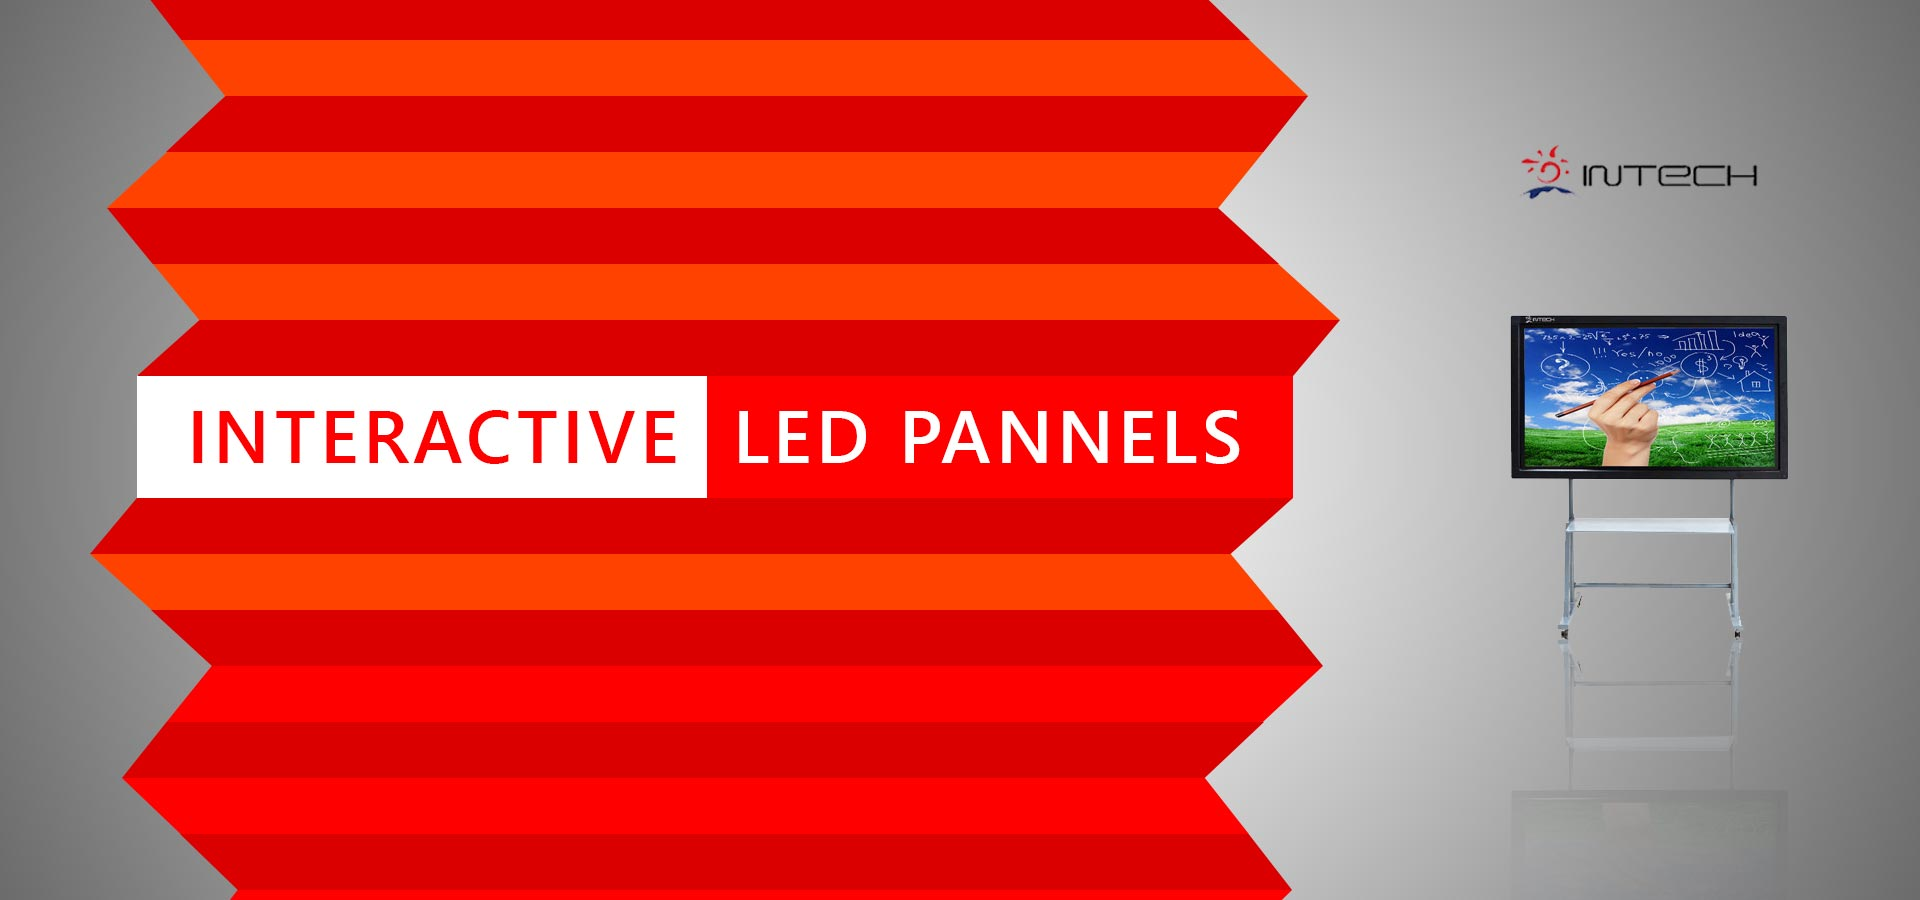 Intech interactive LED display screens